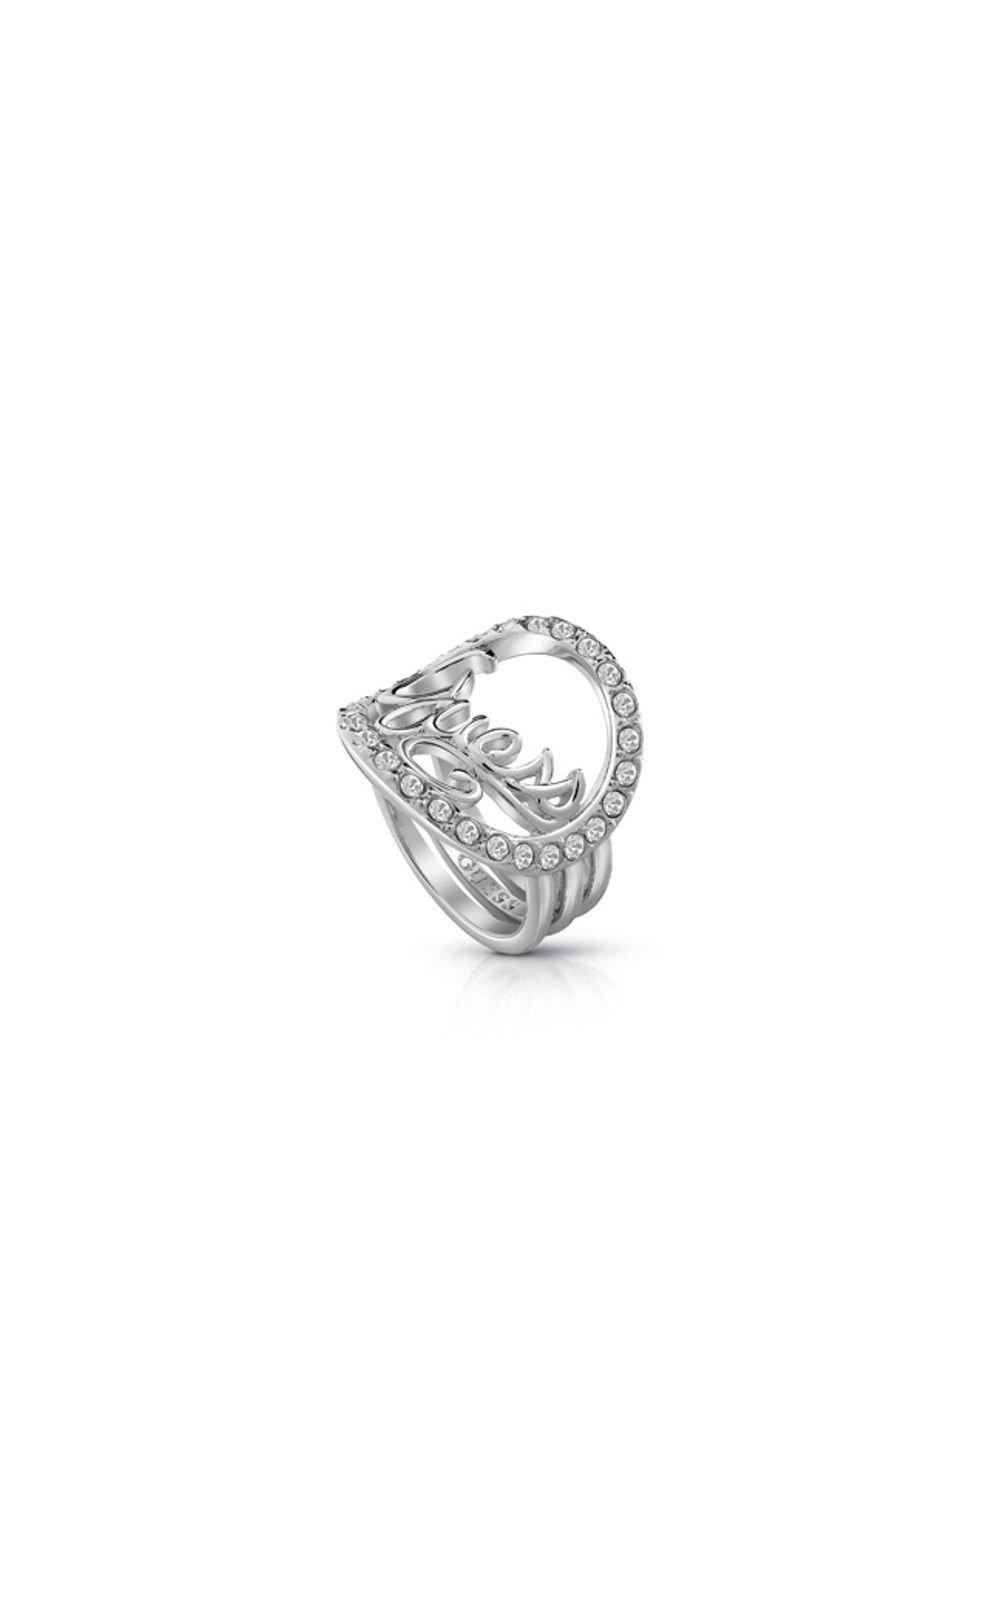 GUESS FAUX UBR85049-54 Ασημένιο Δαχτυλίδι Τρίβερο Με Λογότυπο